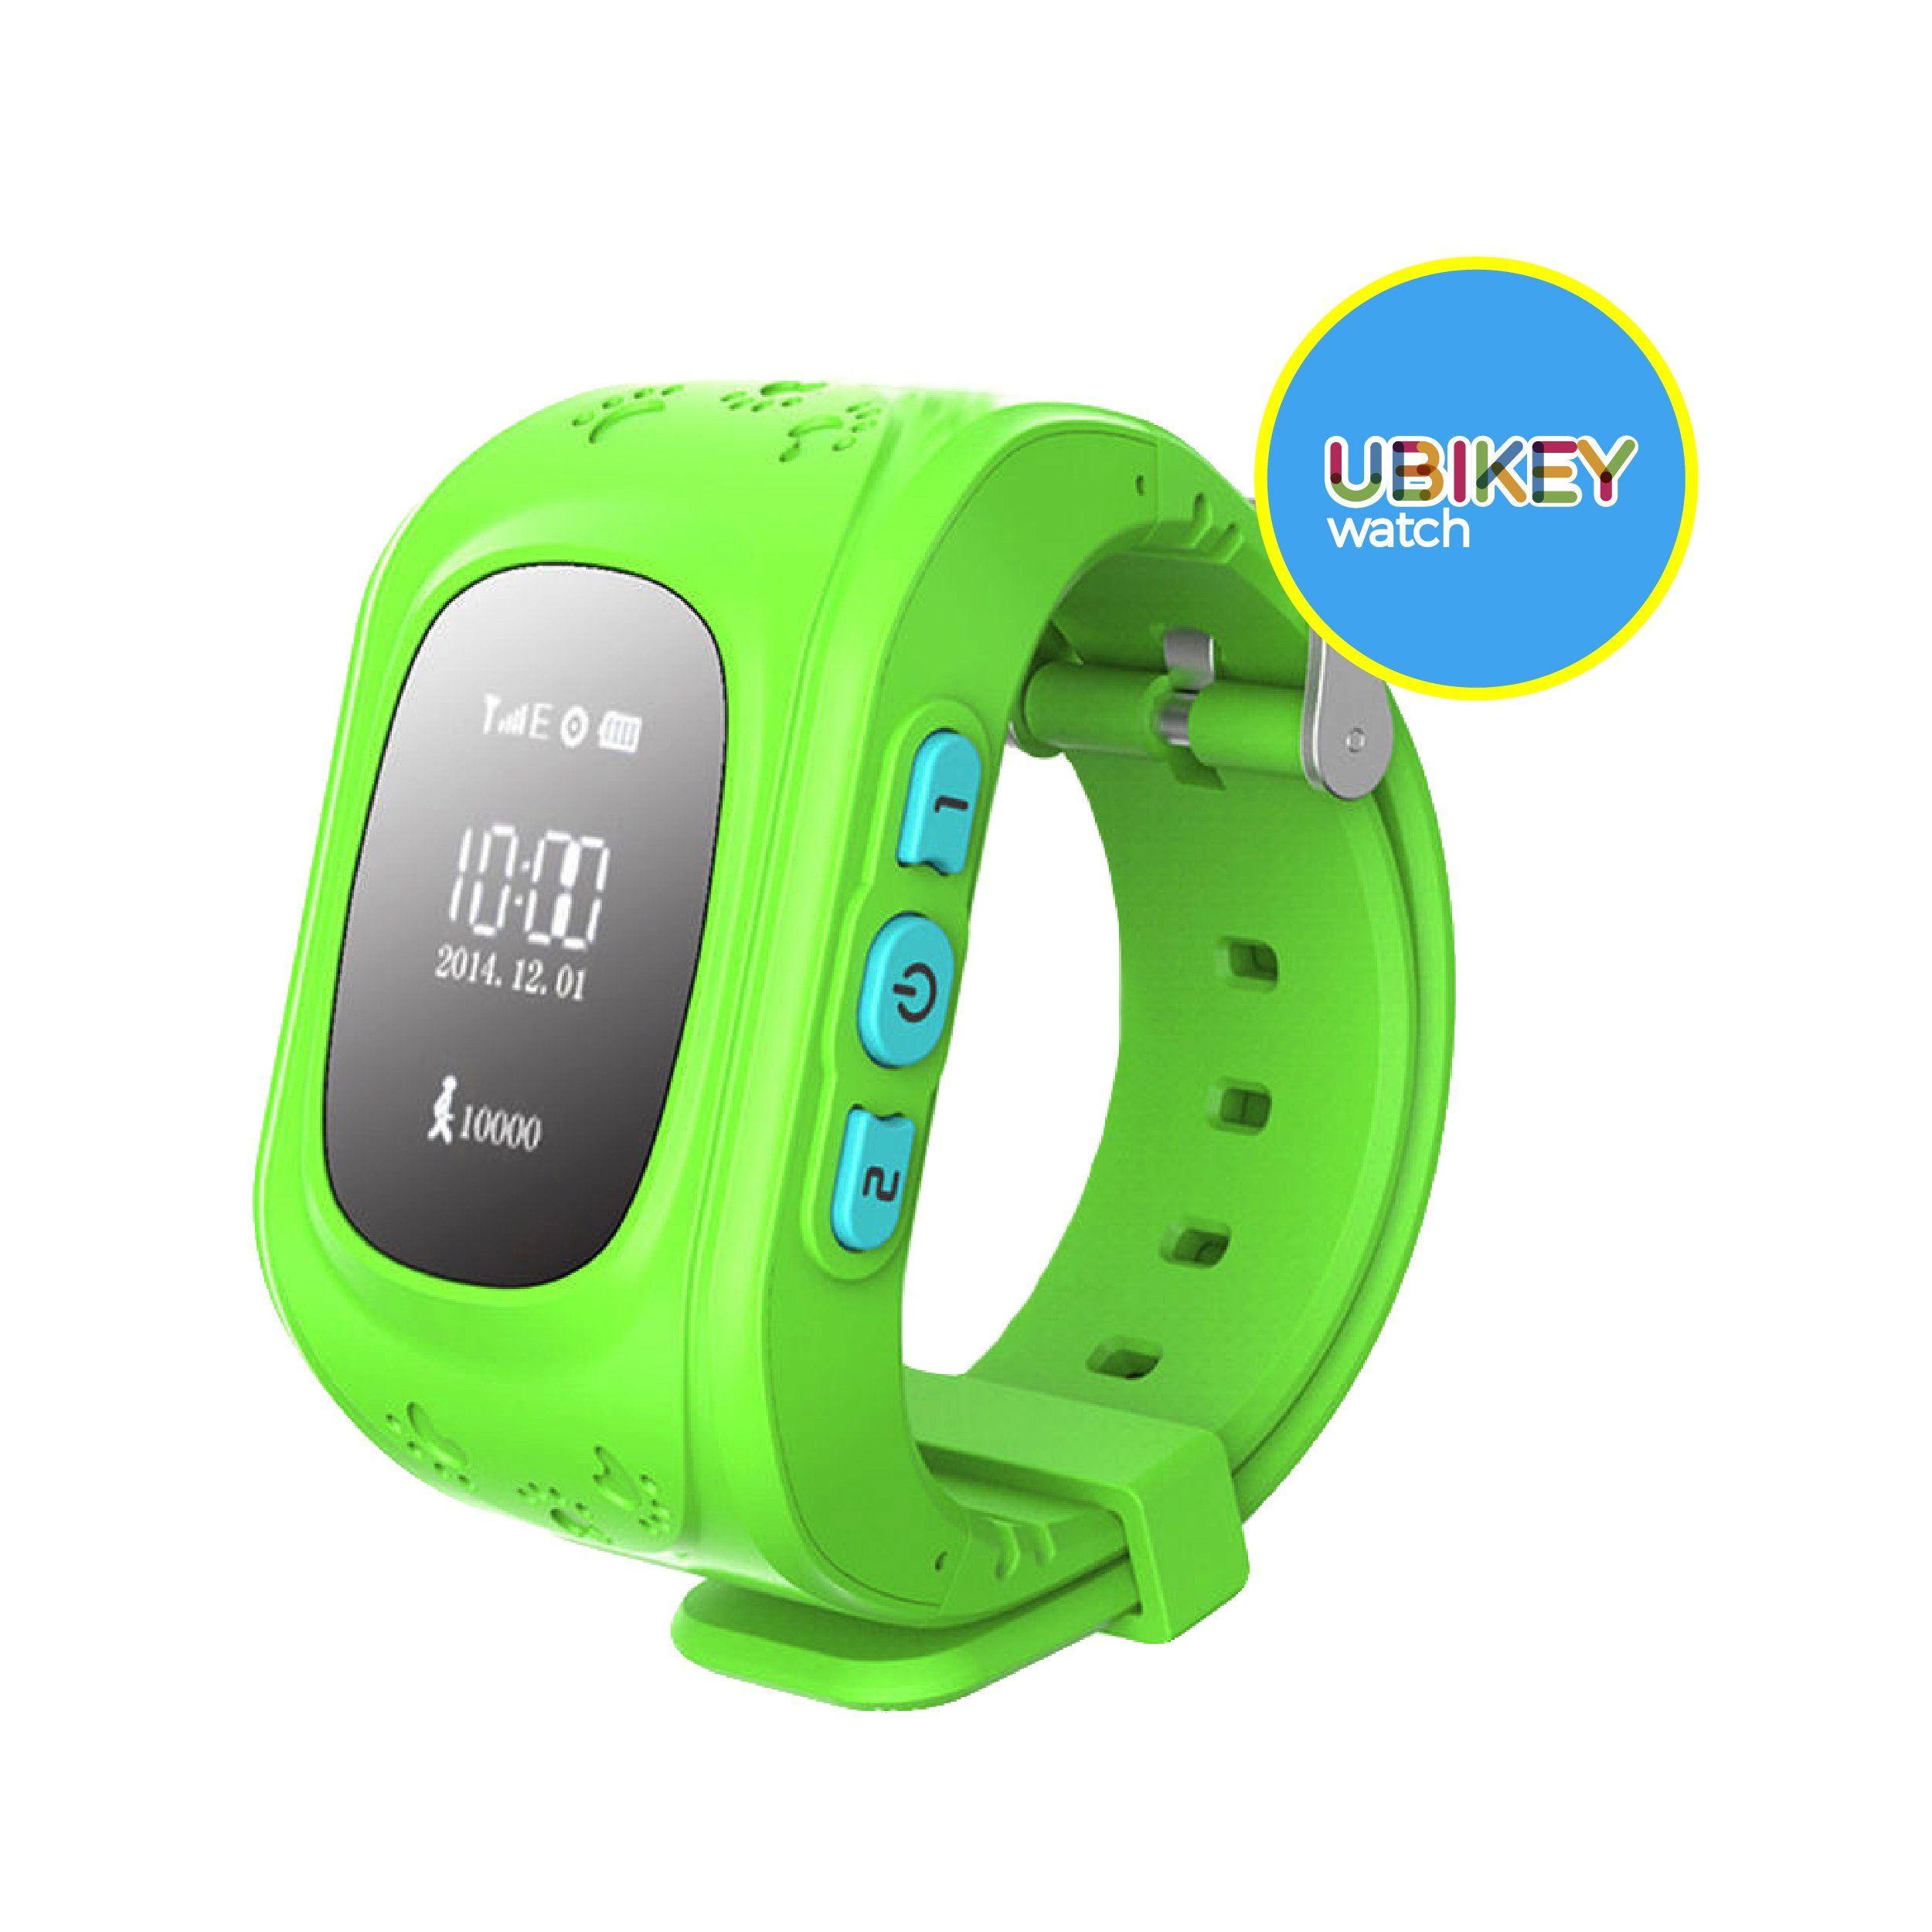 Ubikey Gps Smart Watch Gps Smartwatch Phone Anti Lost Sos Call Children Finder Fitness Tracker Wristwatch Bracelet Wearable Device Watch For Iphone Smart Watch